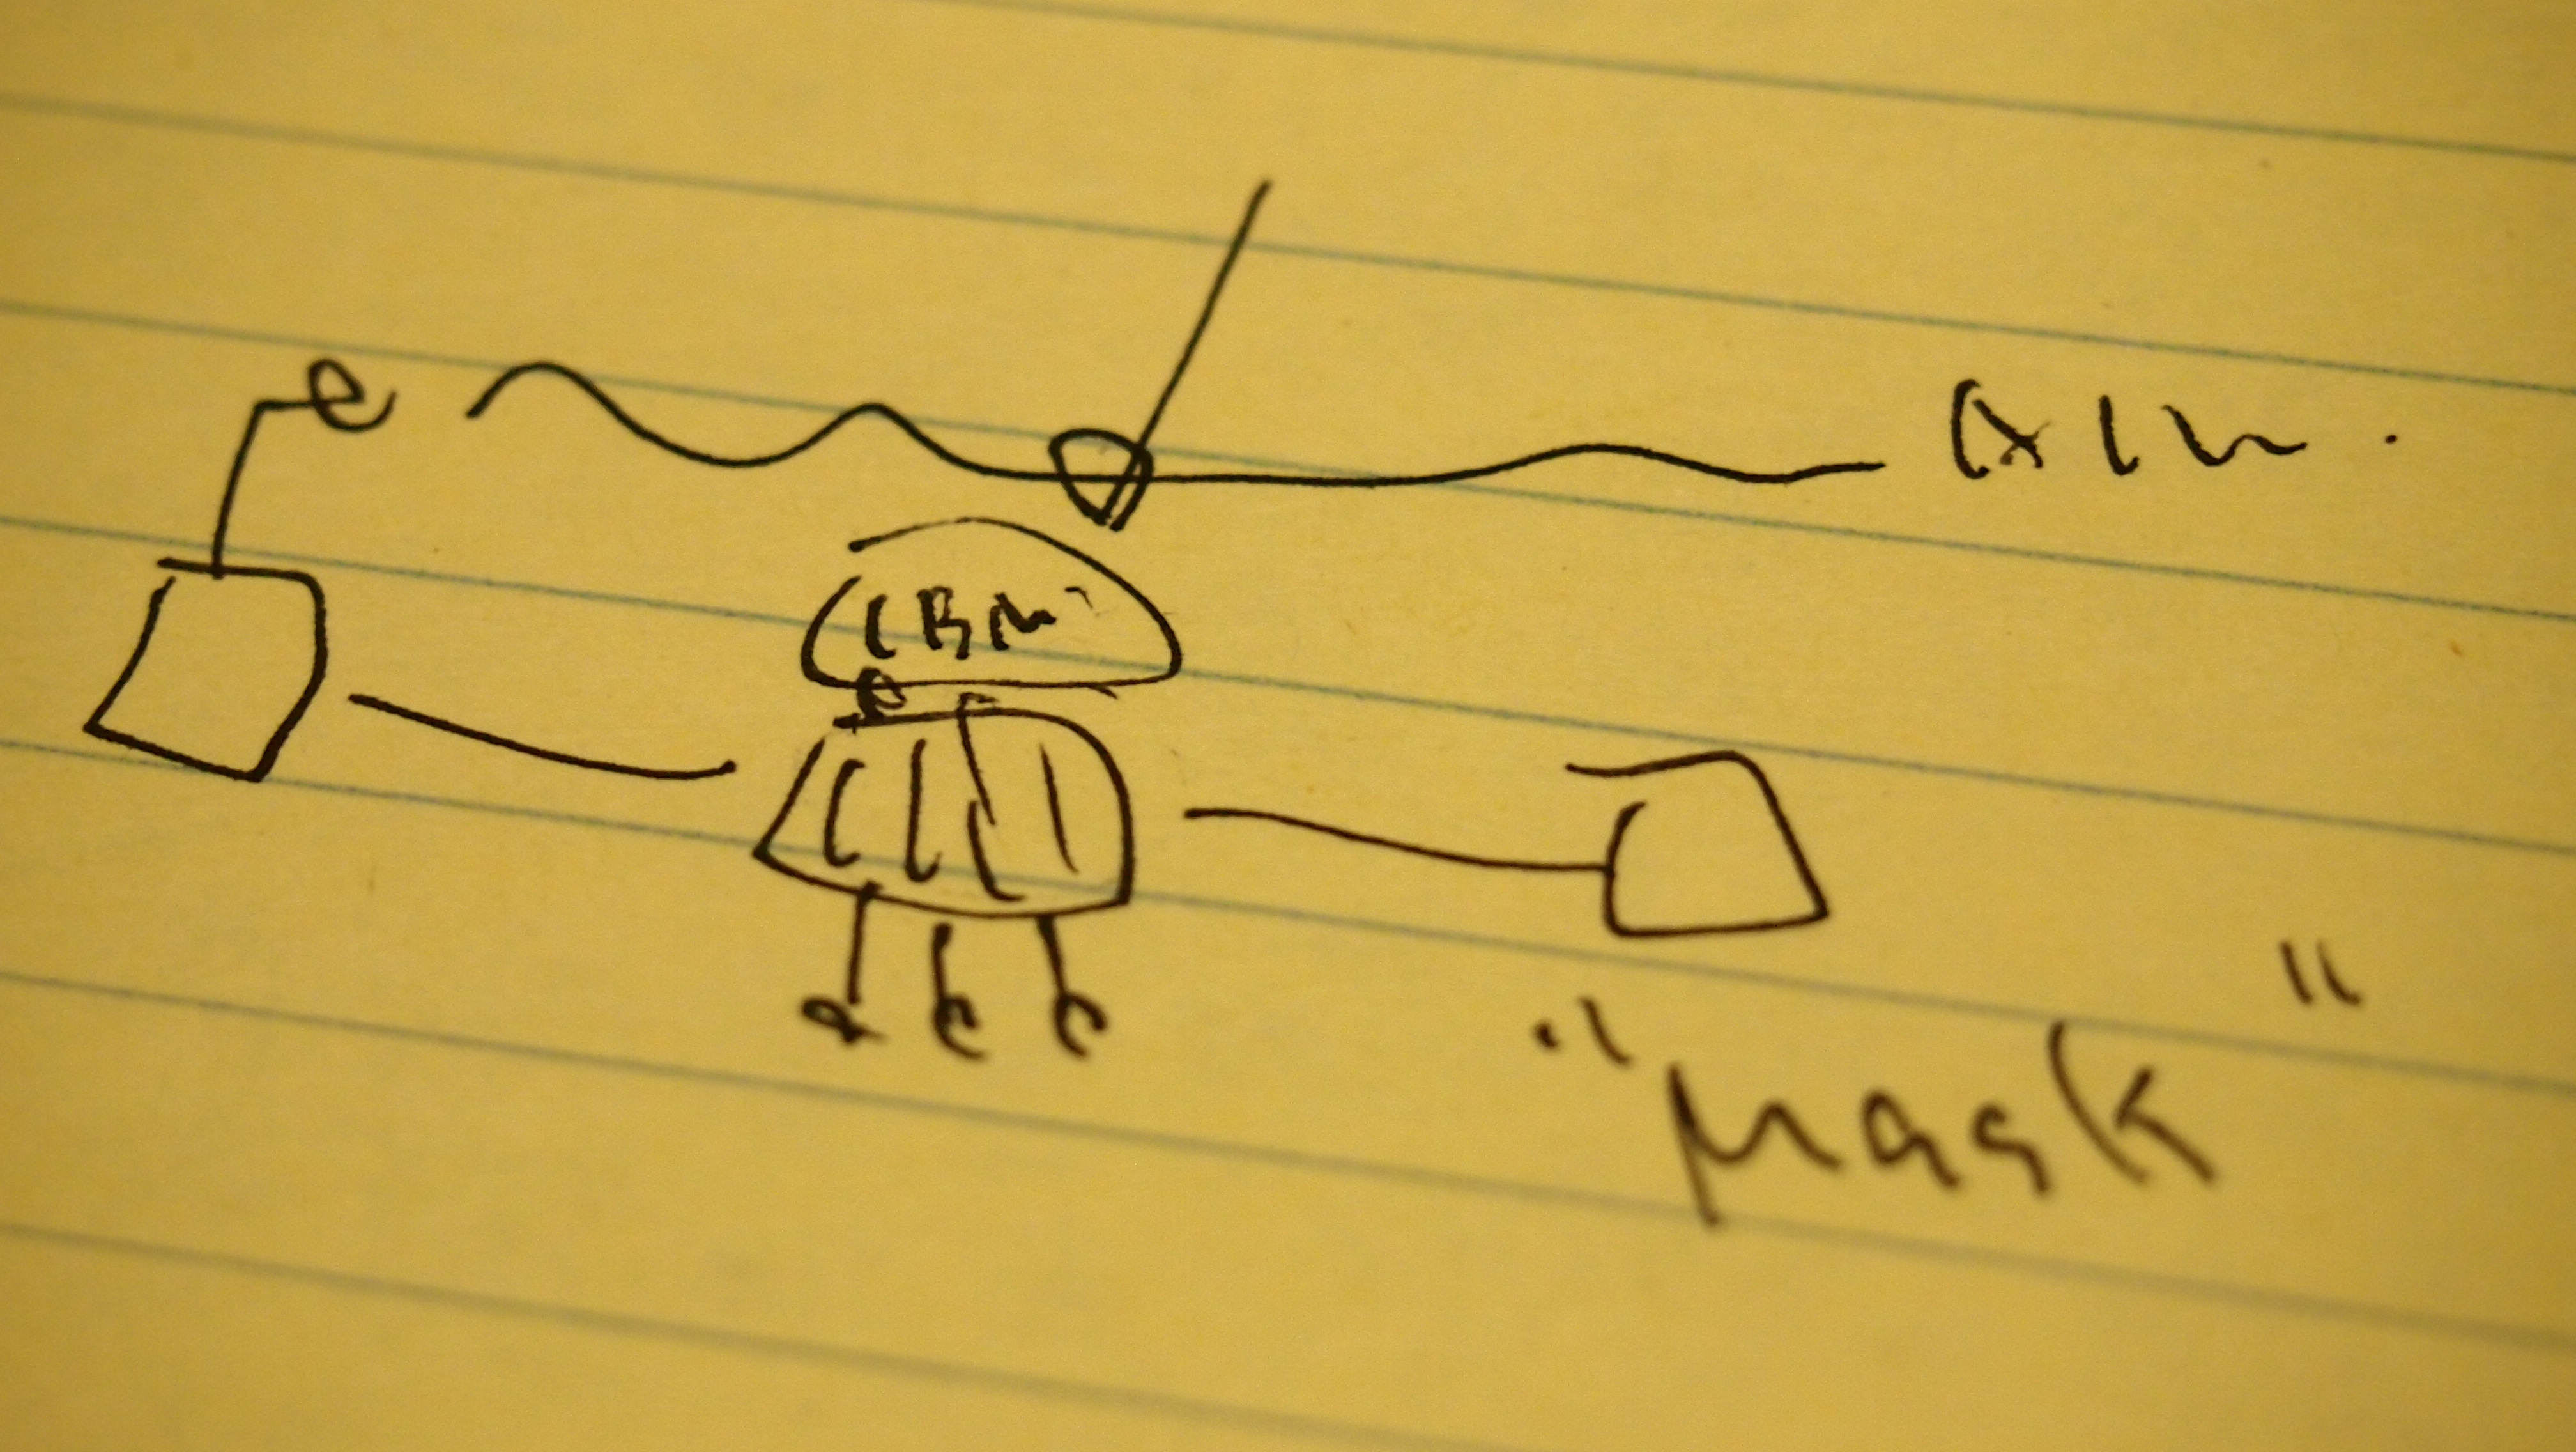 Prof. Saze's Hand-Drawn Diagram